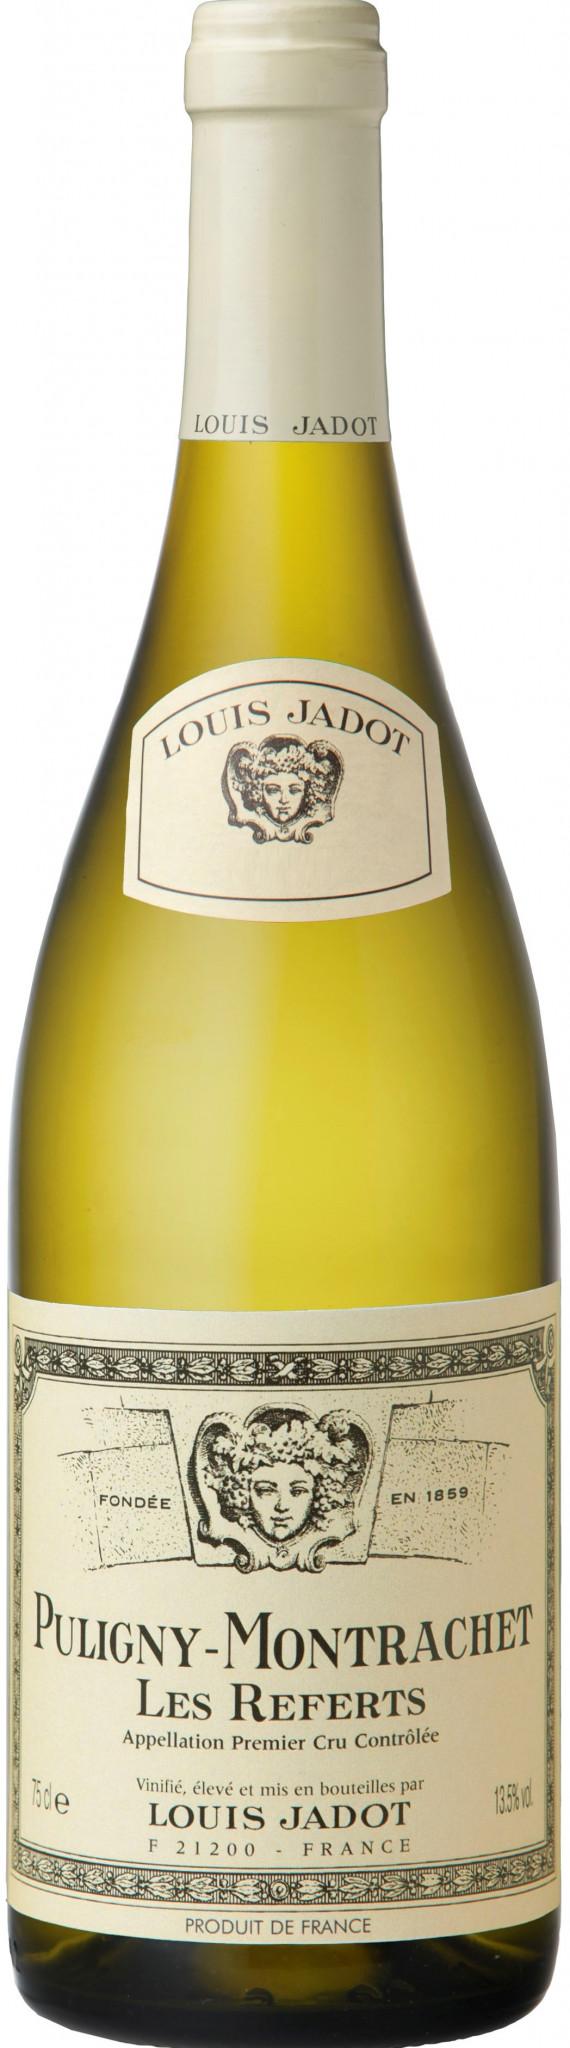 Louis Jadot Puligny Montrachet Les Referts wineaffair